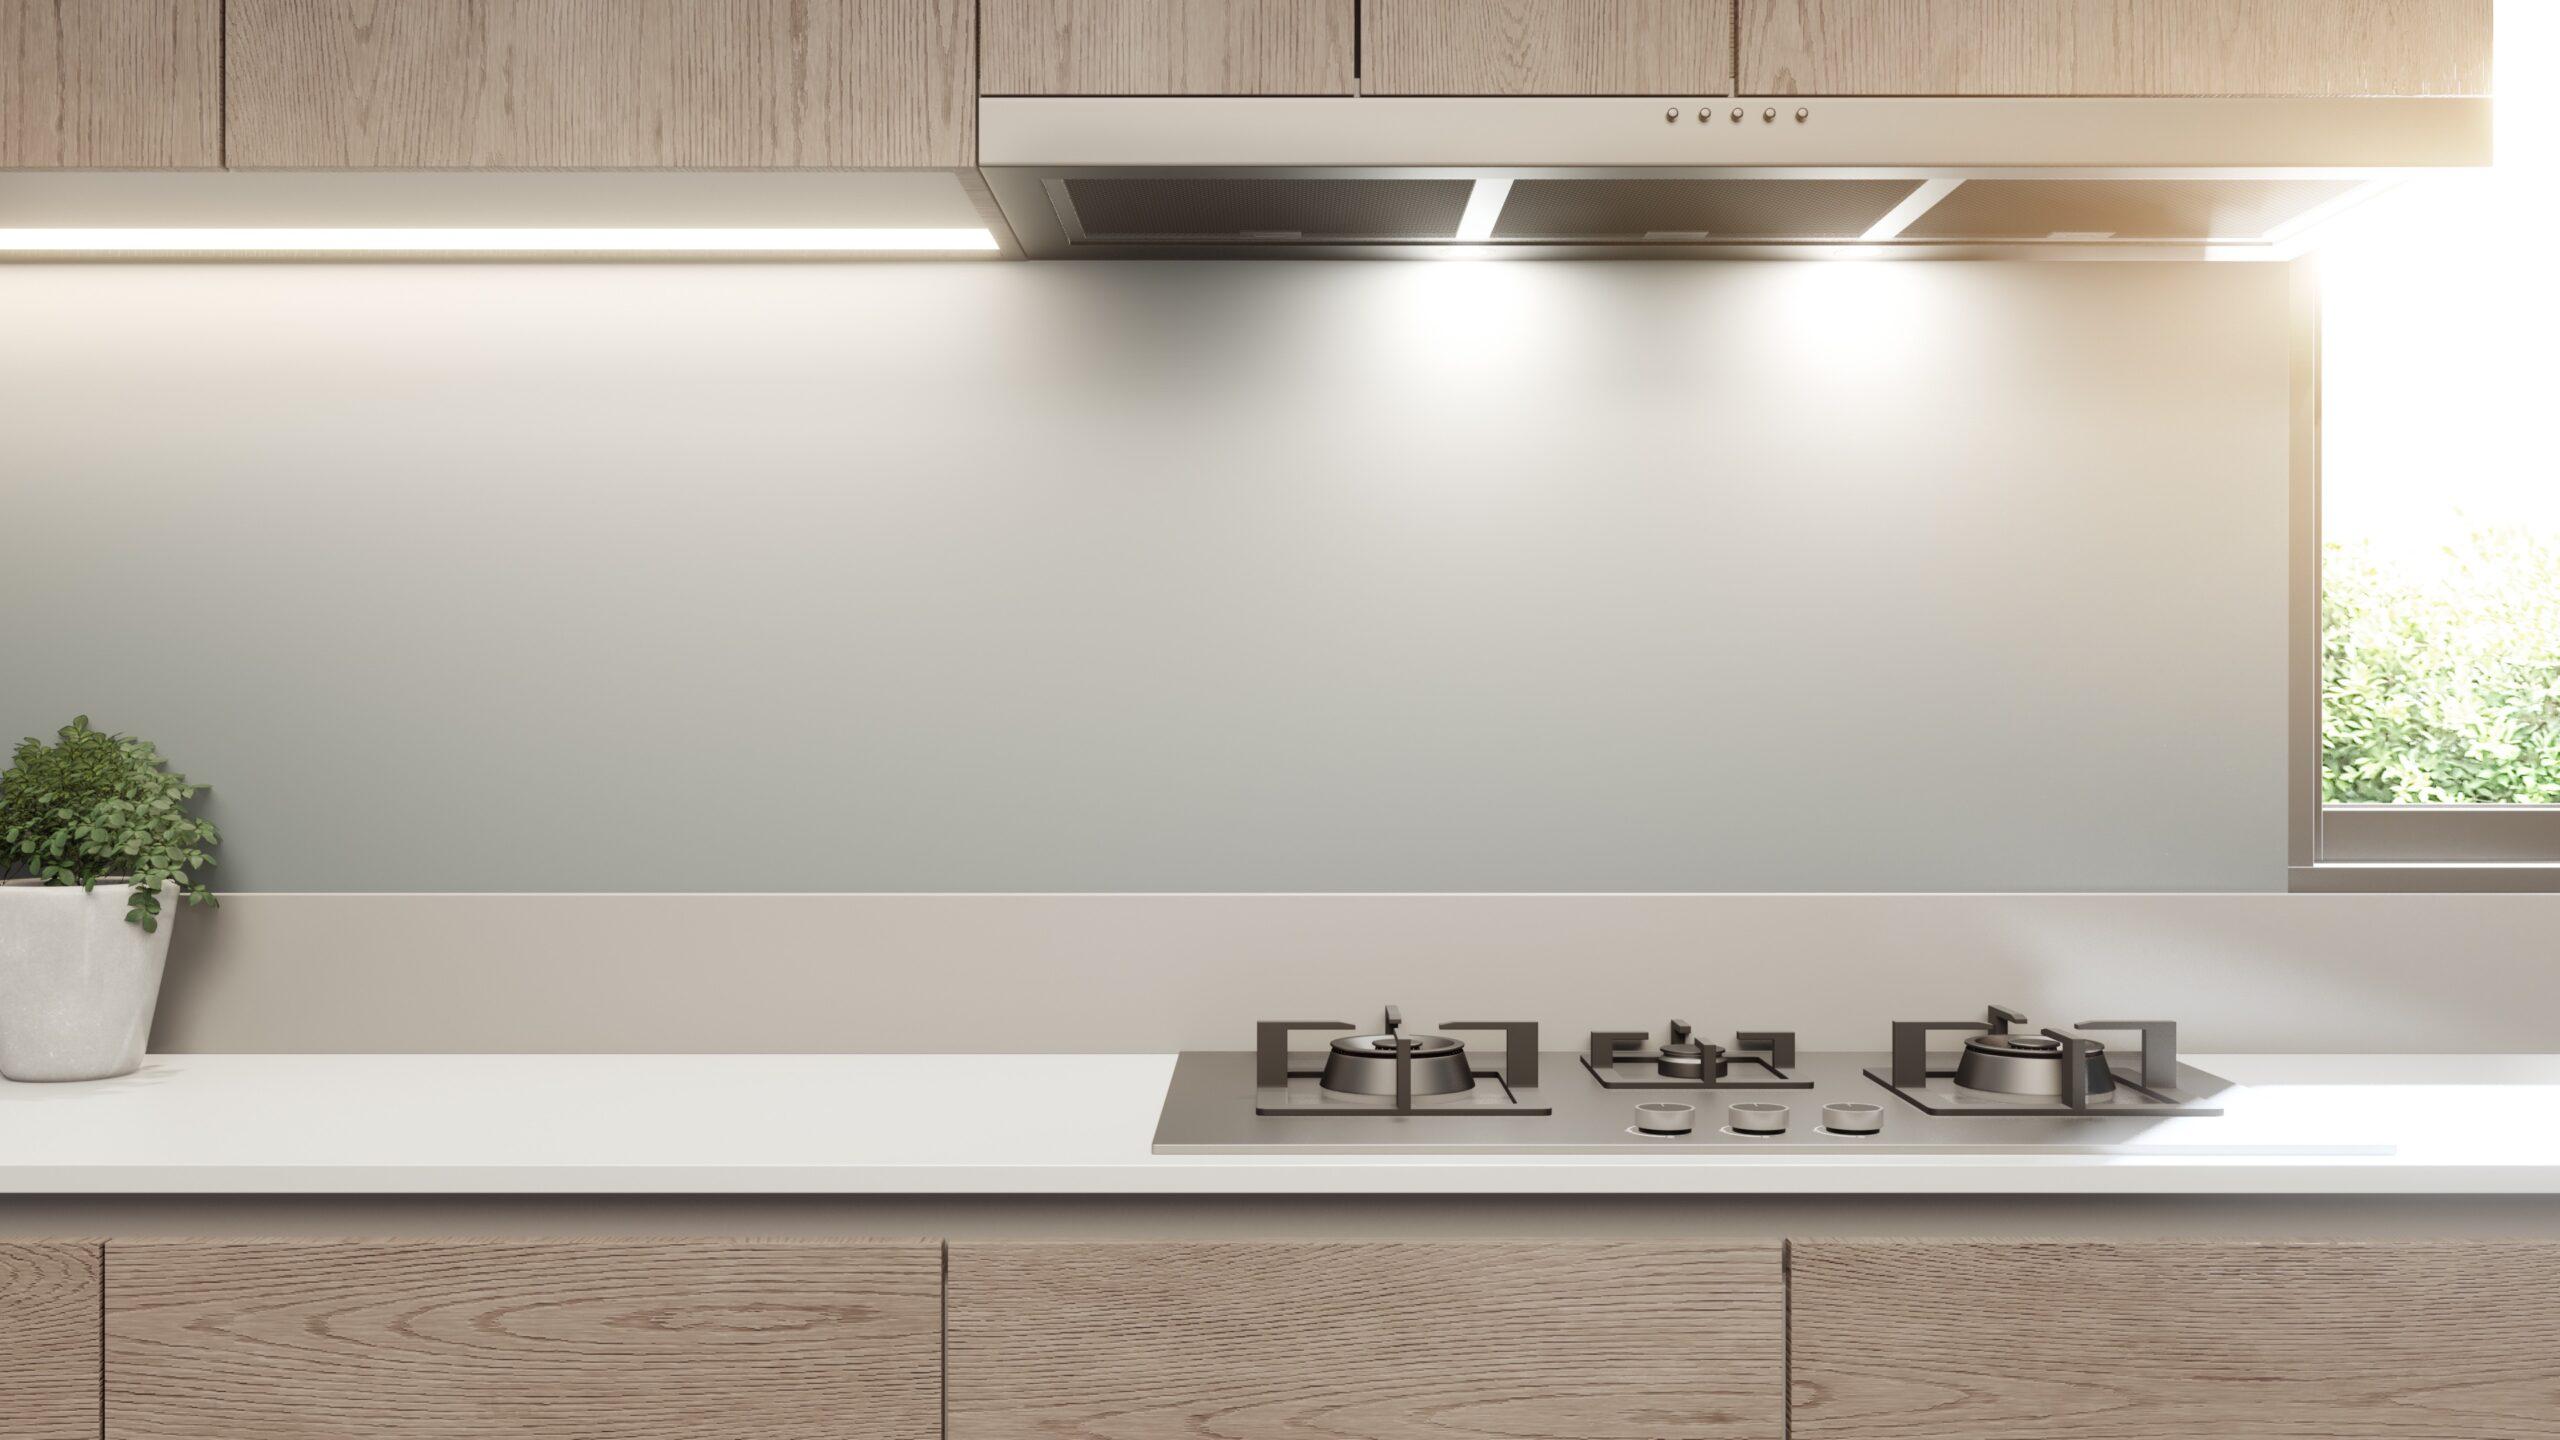 Nyt køkken med LED lys